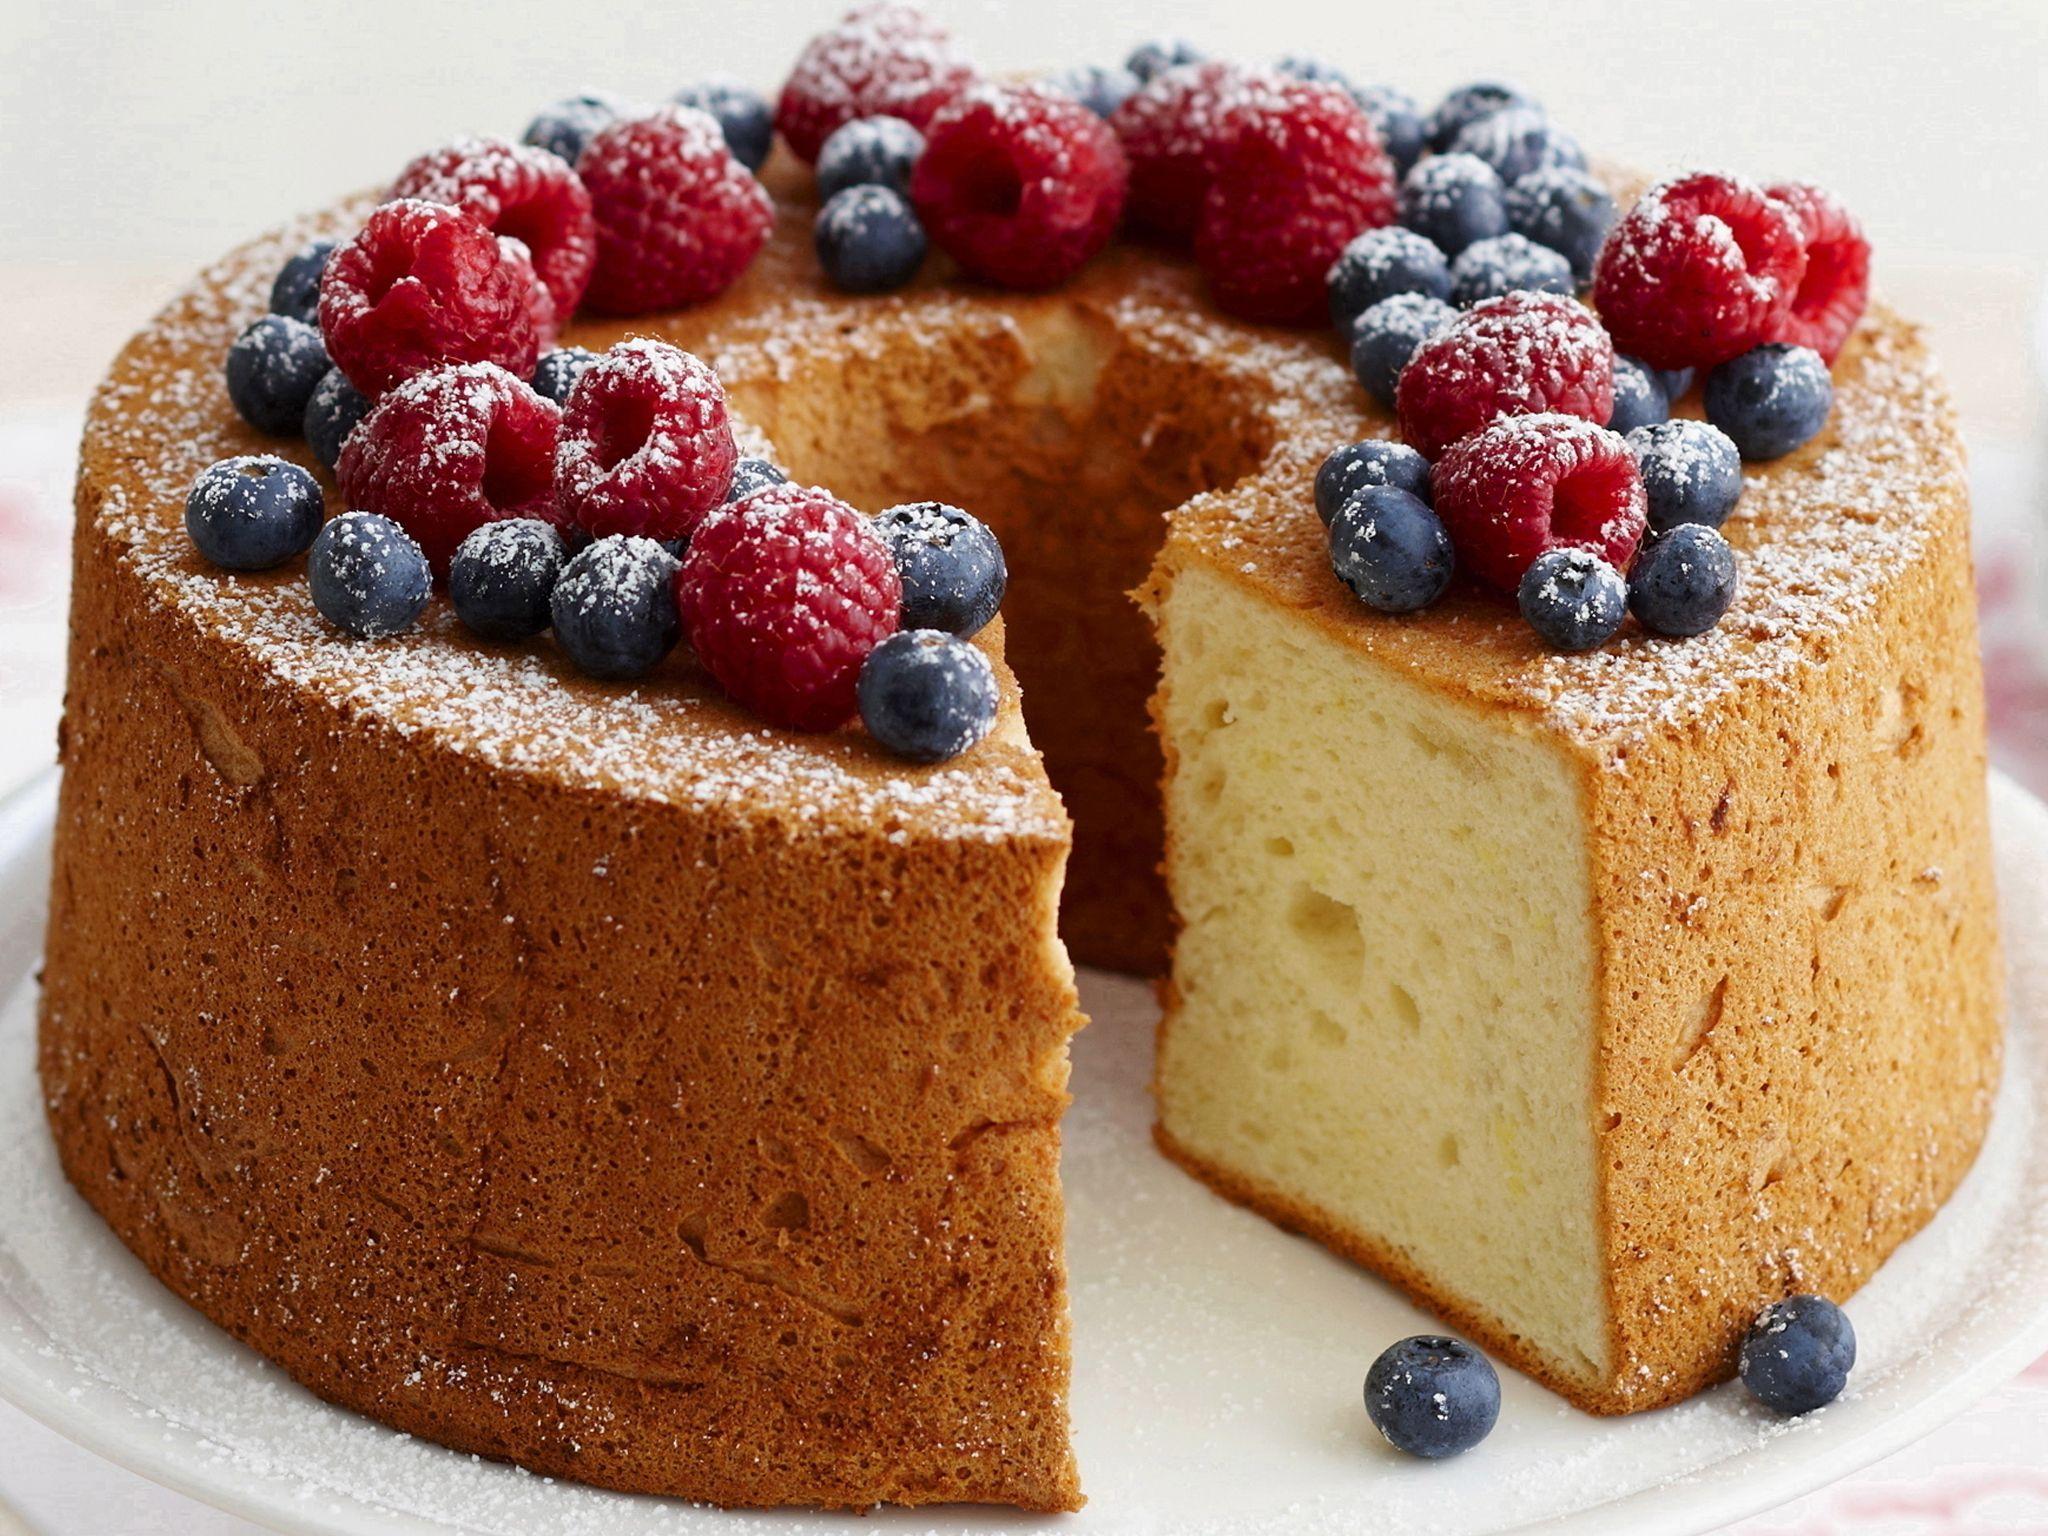 Resultado de imagen para lemon angel food cake limone pinterest food resultado de imagen para lemon angel food cake forumfinder Images